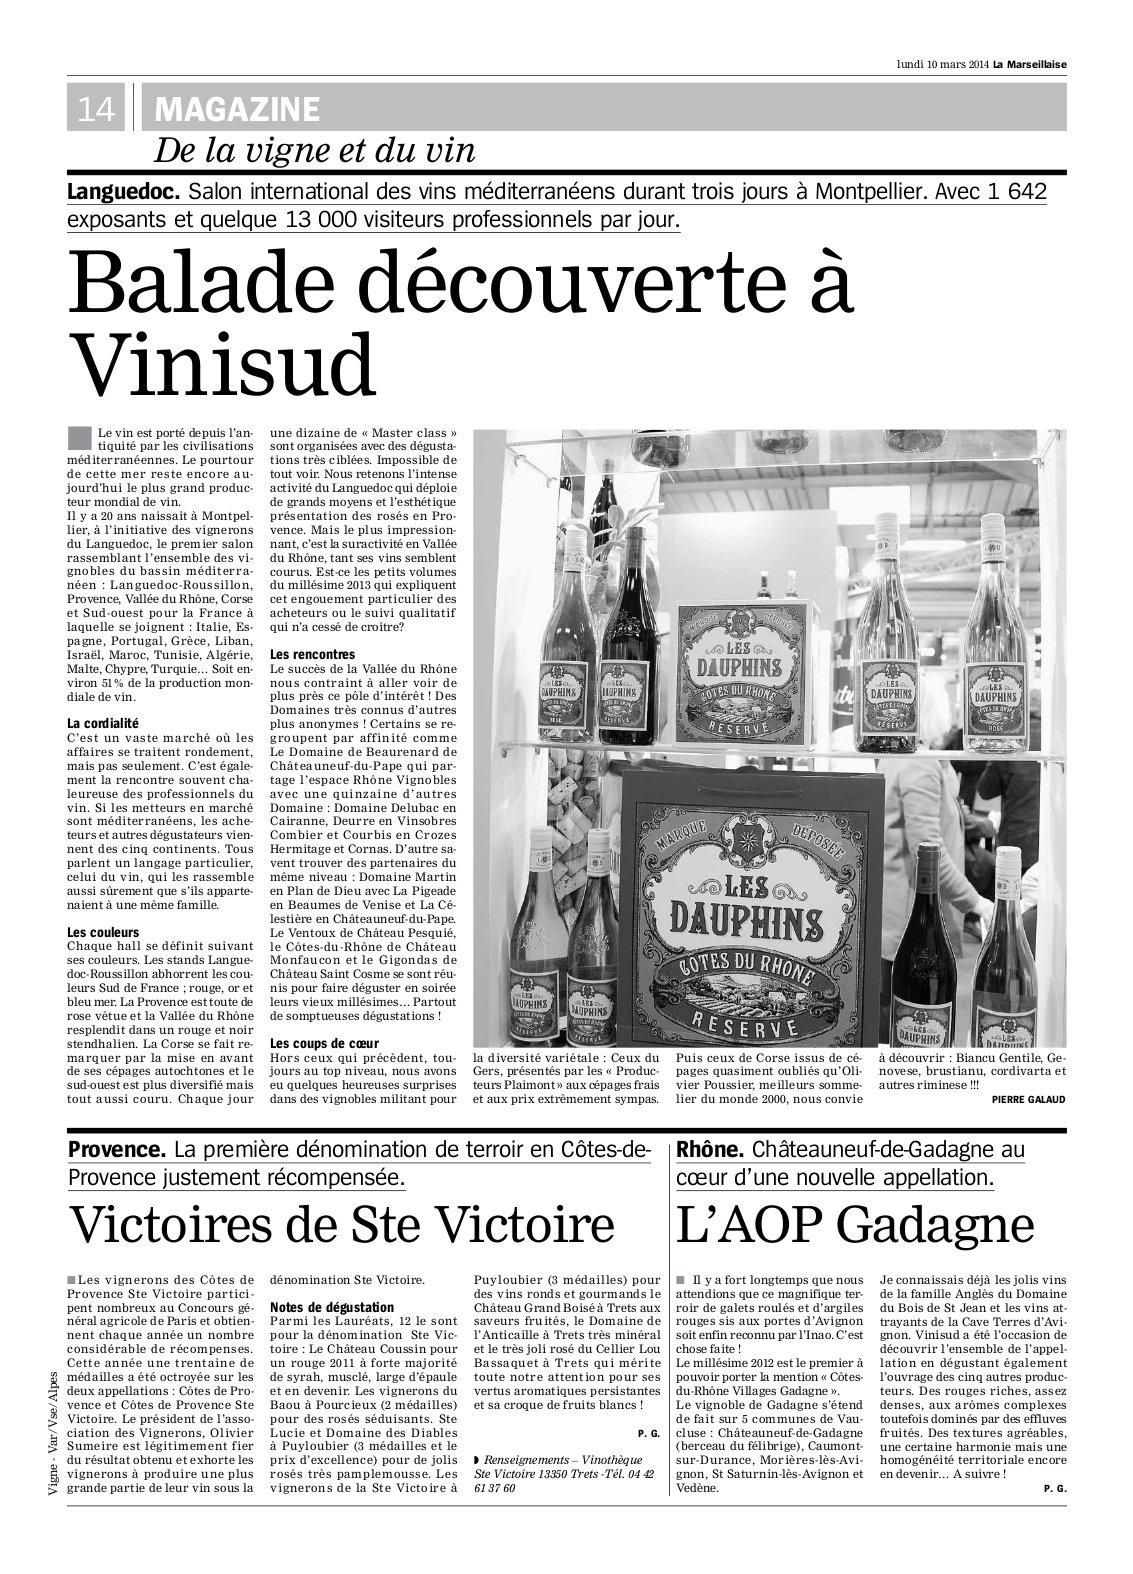 Article Gadagne La Marseillaise 2014